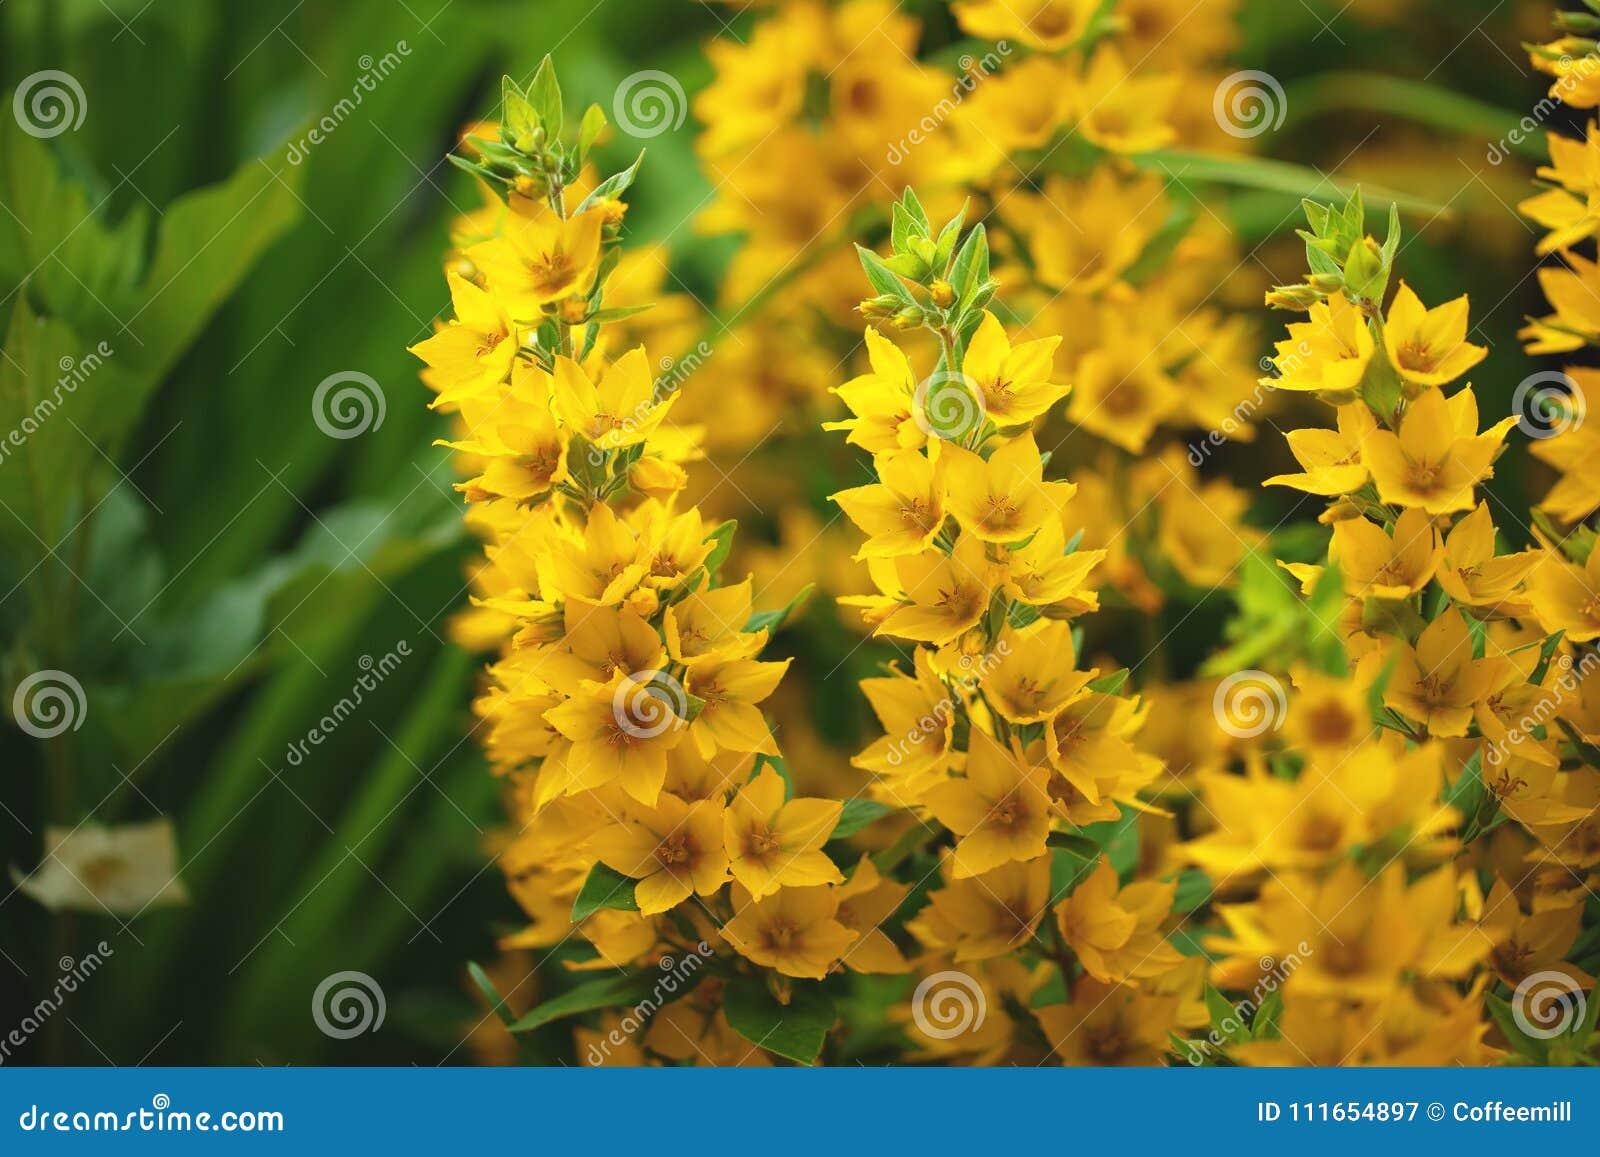 Bush small yellow flowers on background stock image image of many download bush small yellow flowers on background stock image image of many clean mightylinksfo